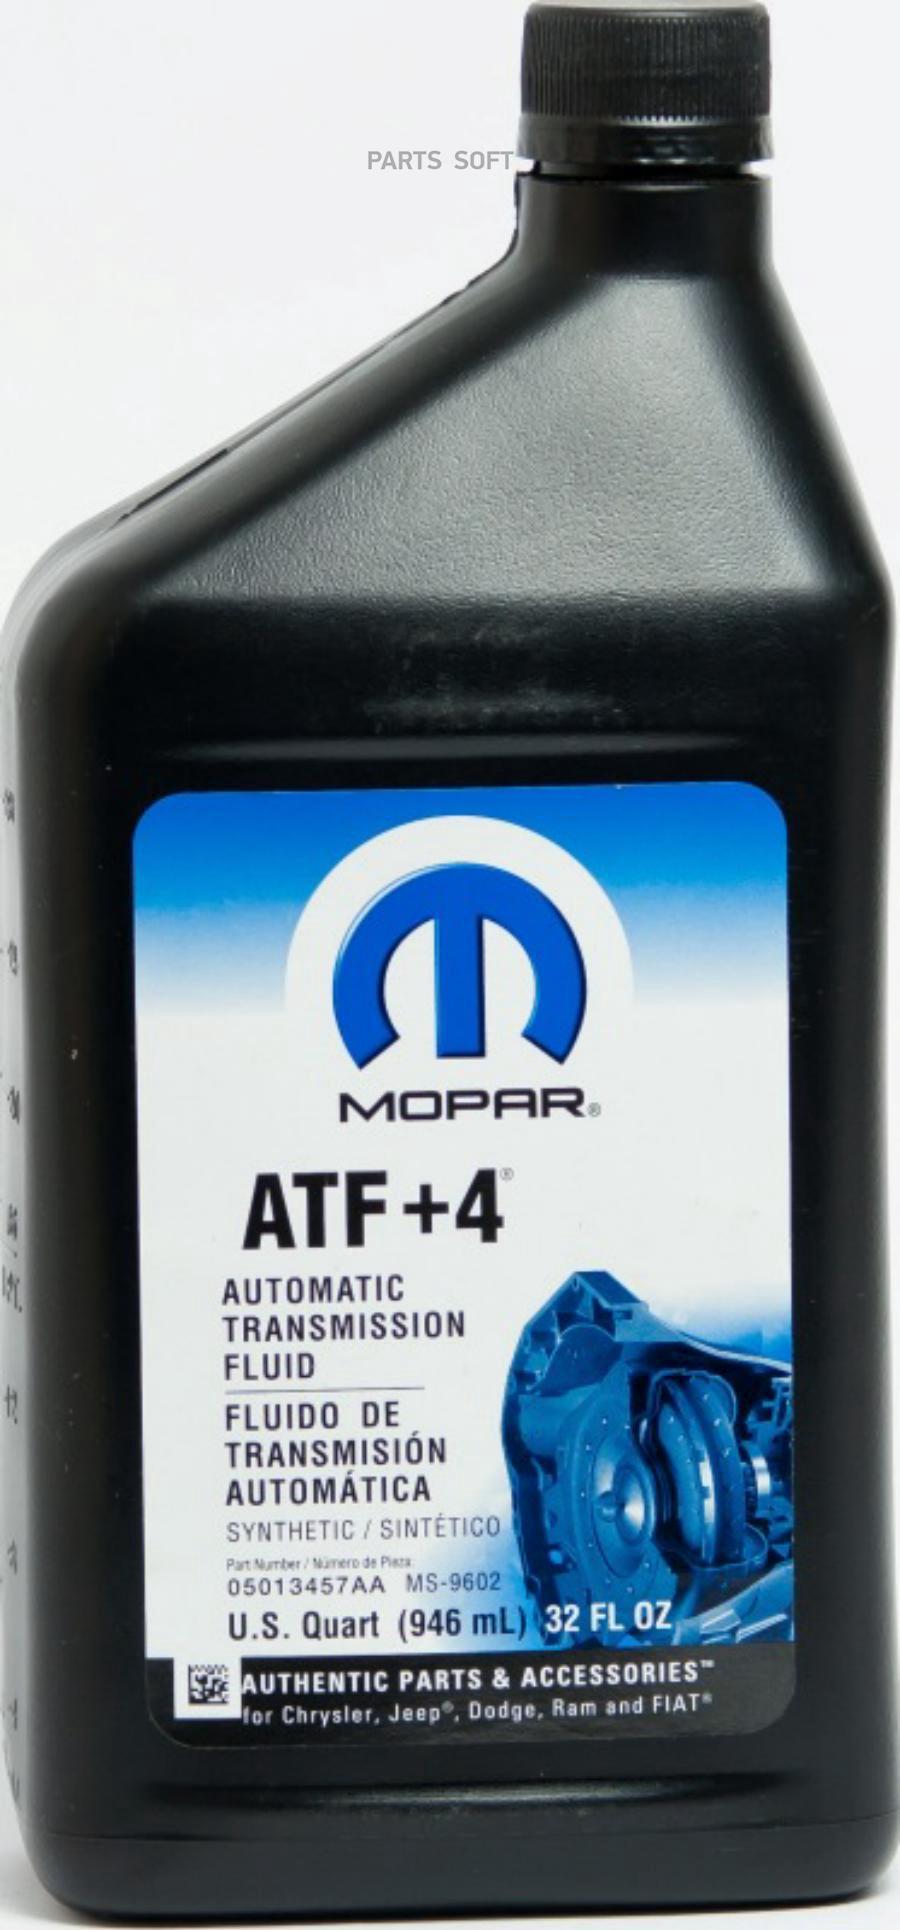 MOPAR ATF+4 05013457AA